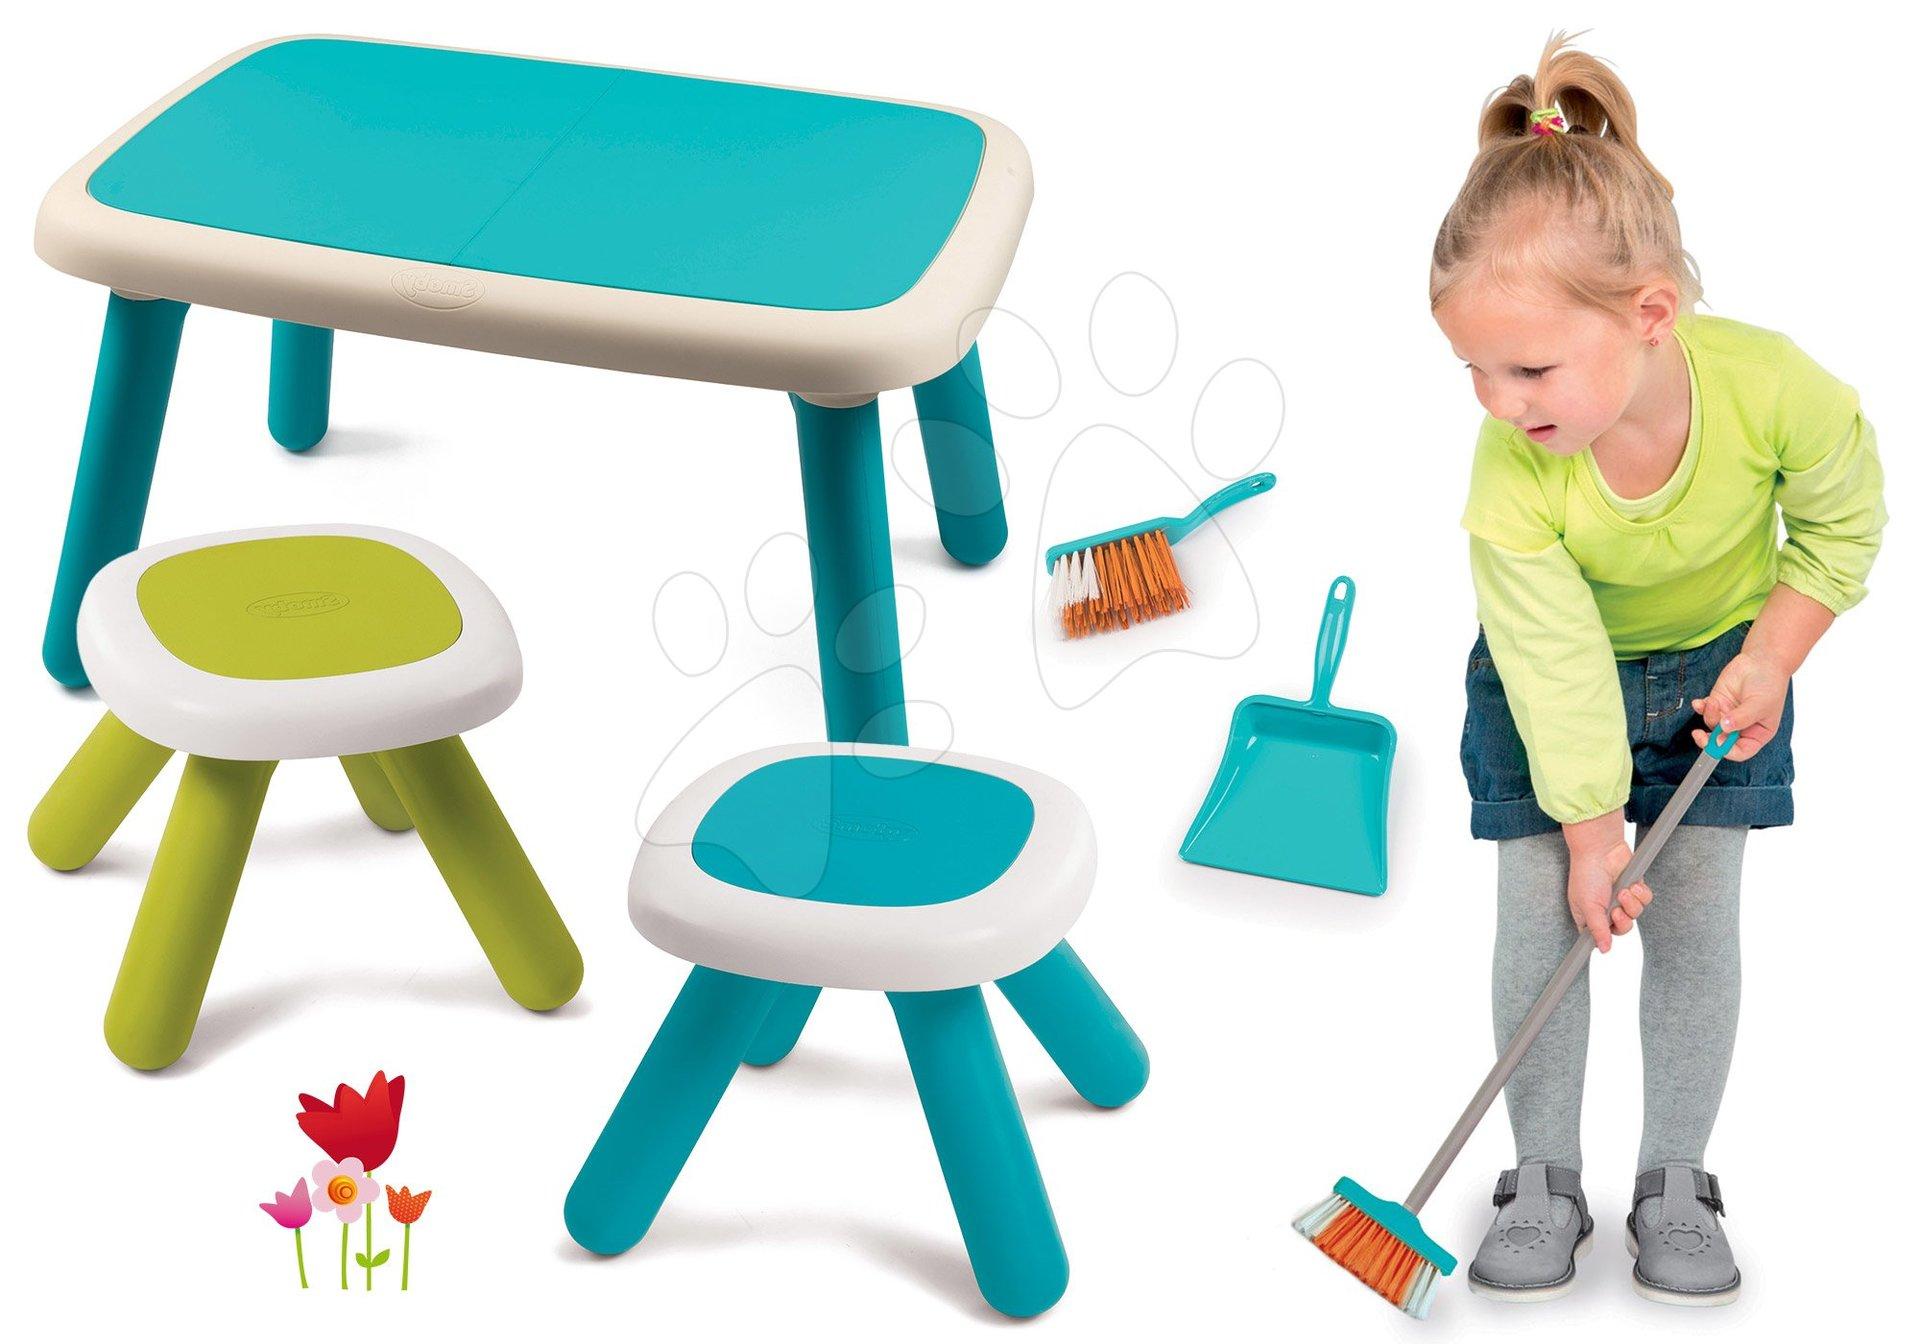 Set stôl pre deti KidTable modrý Smoby s dvoma stolčekmi s UV filtrom a metla s lopatkou